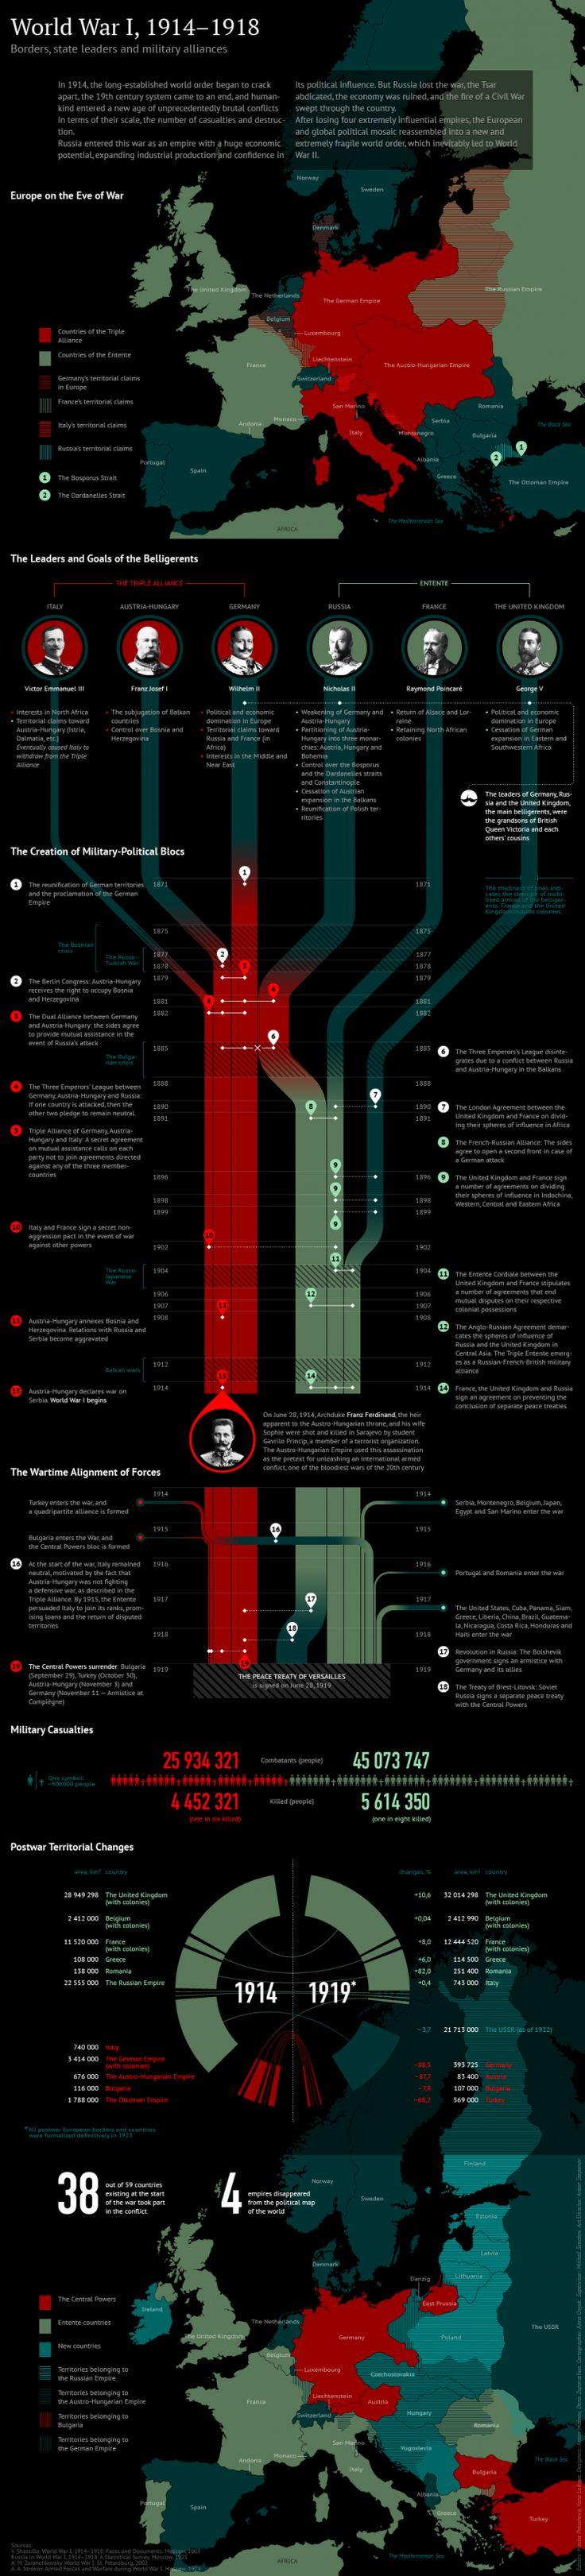 World War I, 1914-1918, Infographic by RIA Novosti This is Visual Journalism [75] | Visualoop